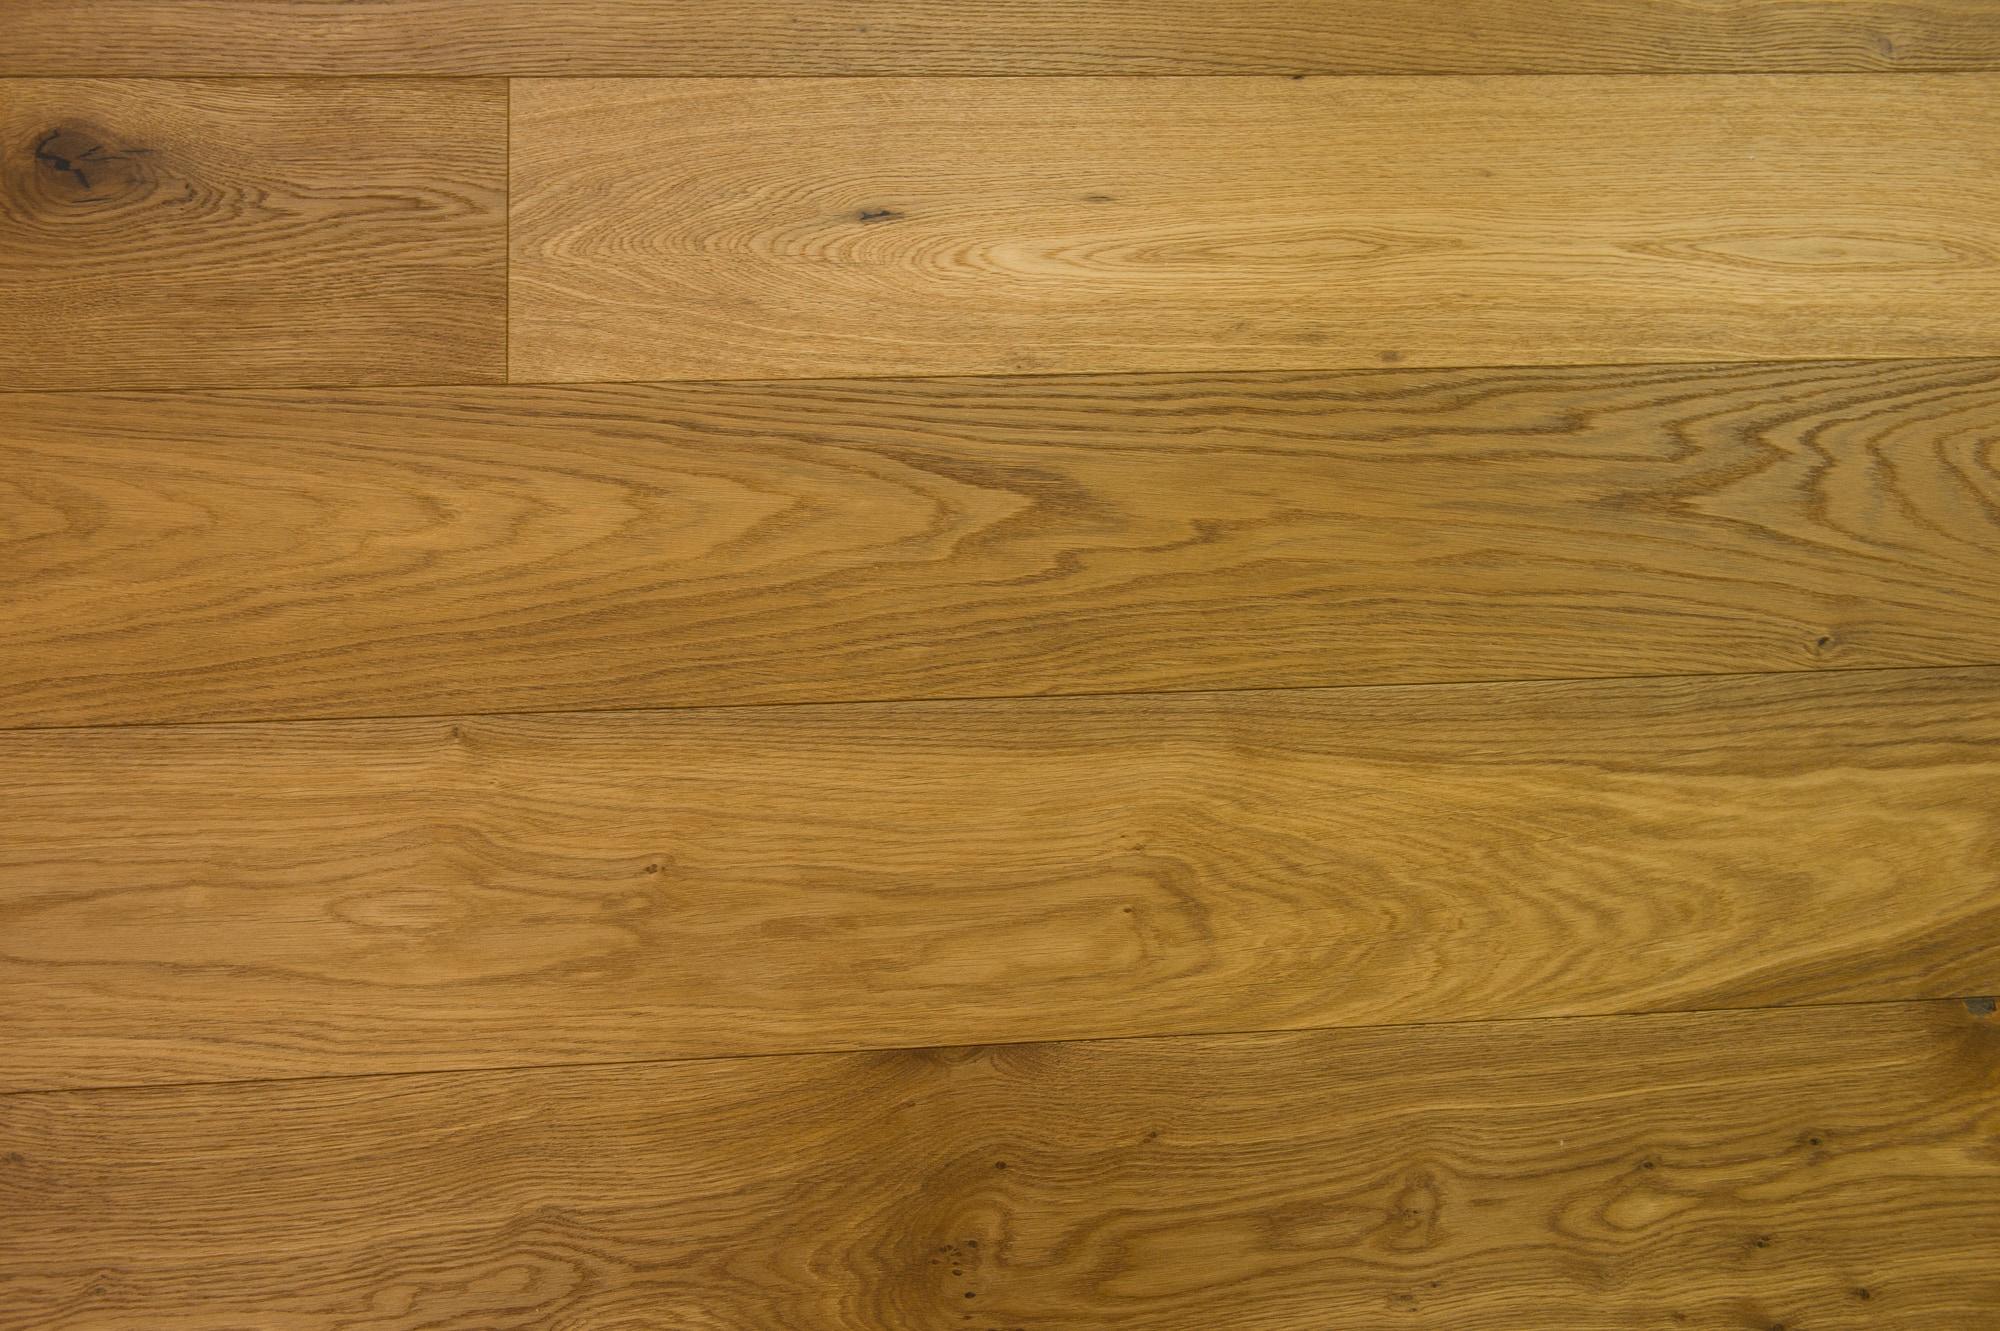 "Buckwheat / European White Oak / UV Oil Finish / ABCD / 1/2"" x 7-1/2"" Engineered Hardwood - European White Oak - Denali Collection 0"